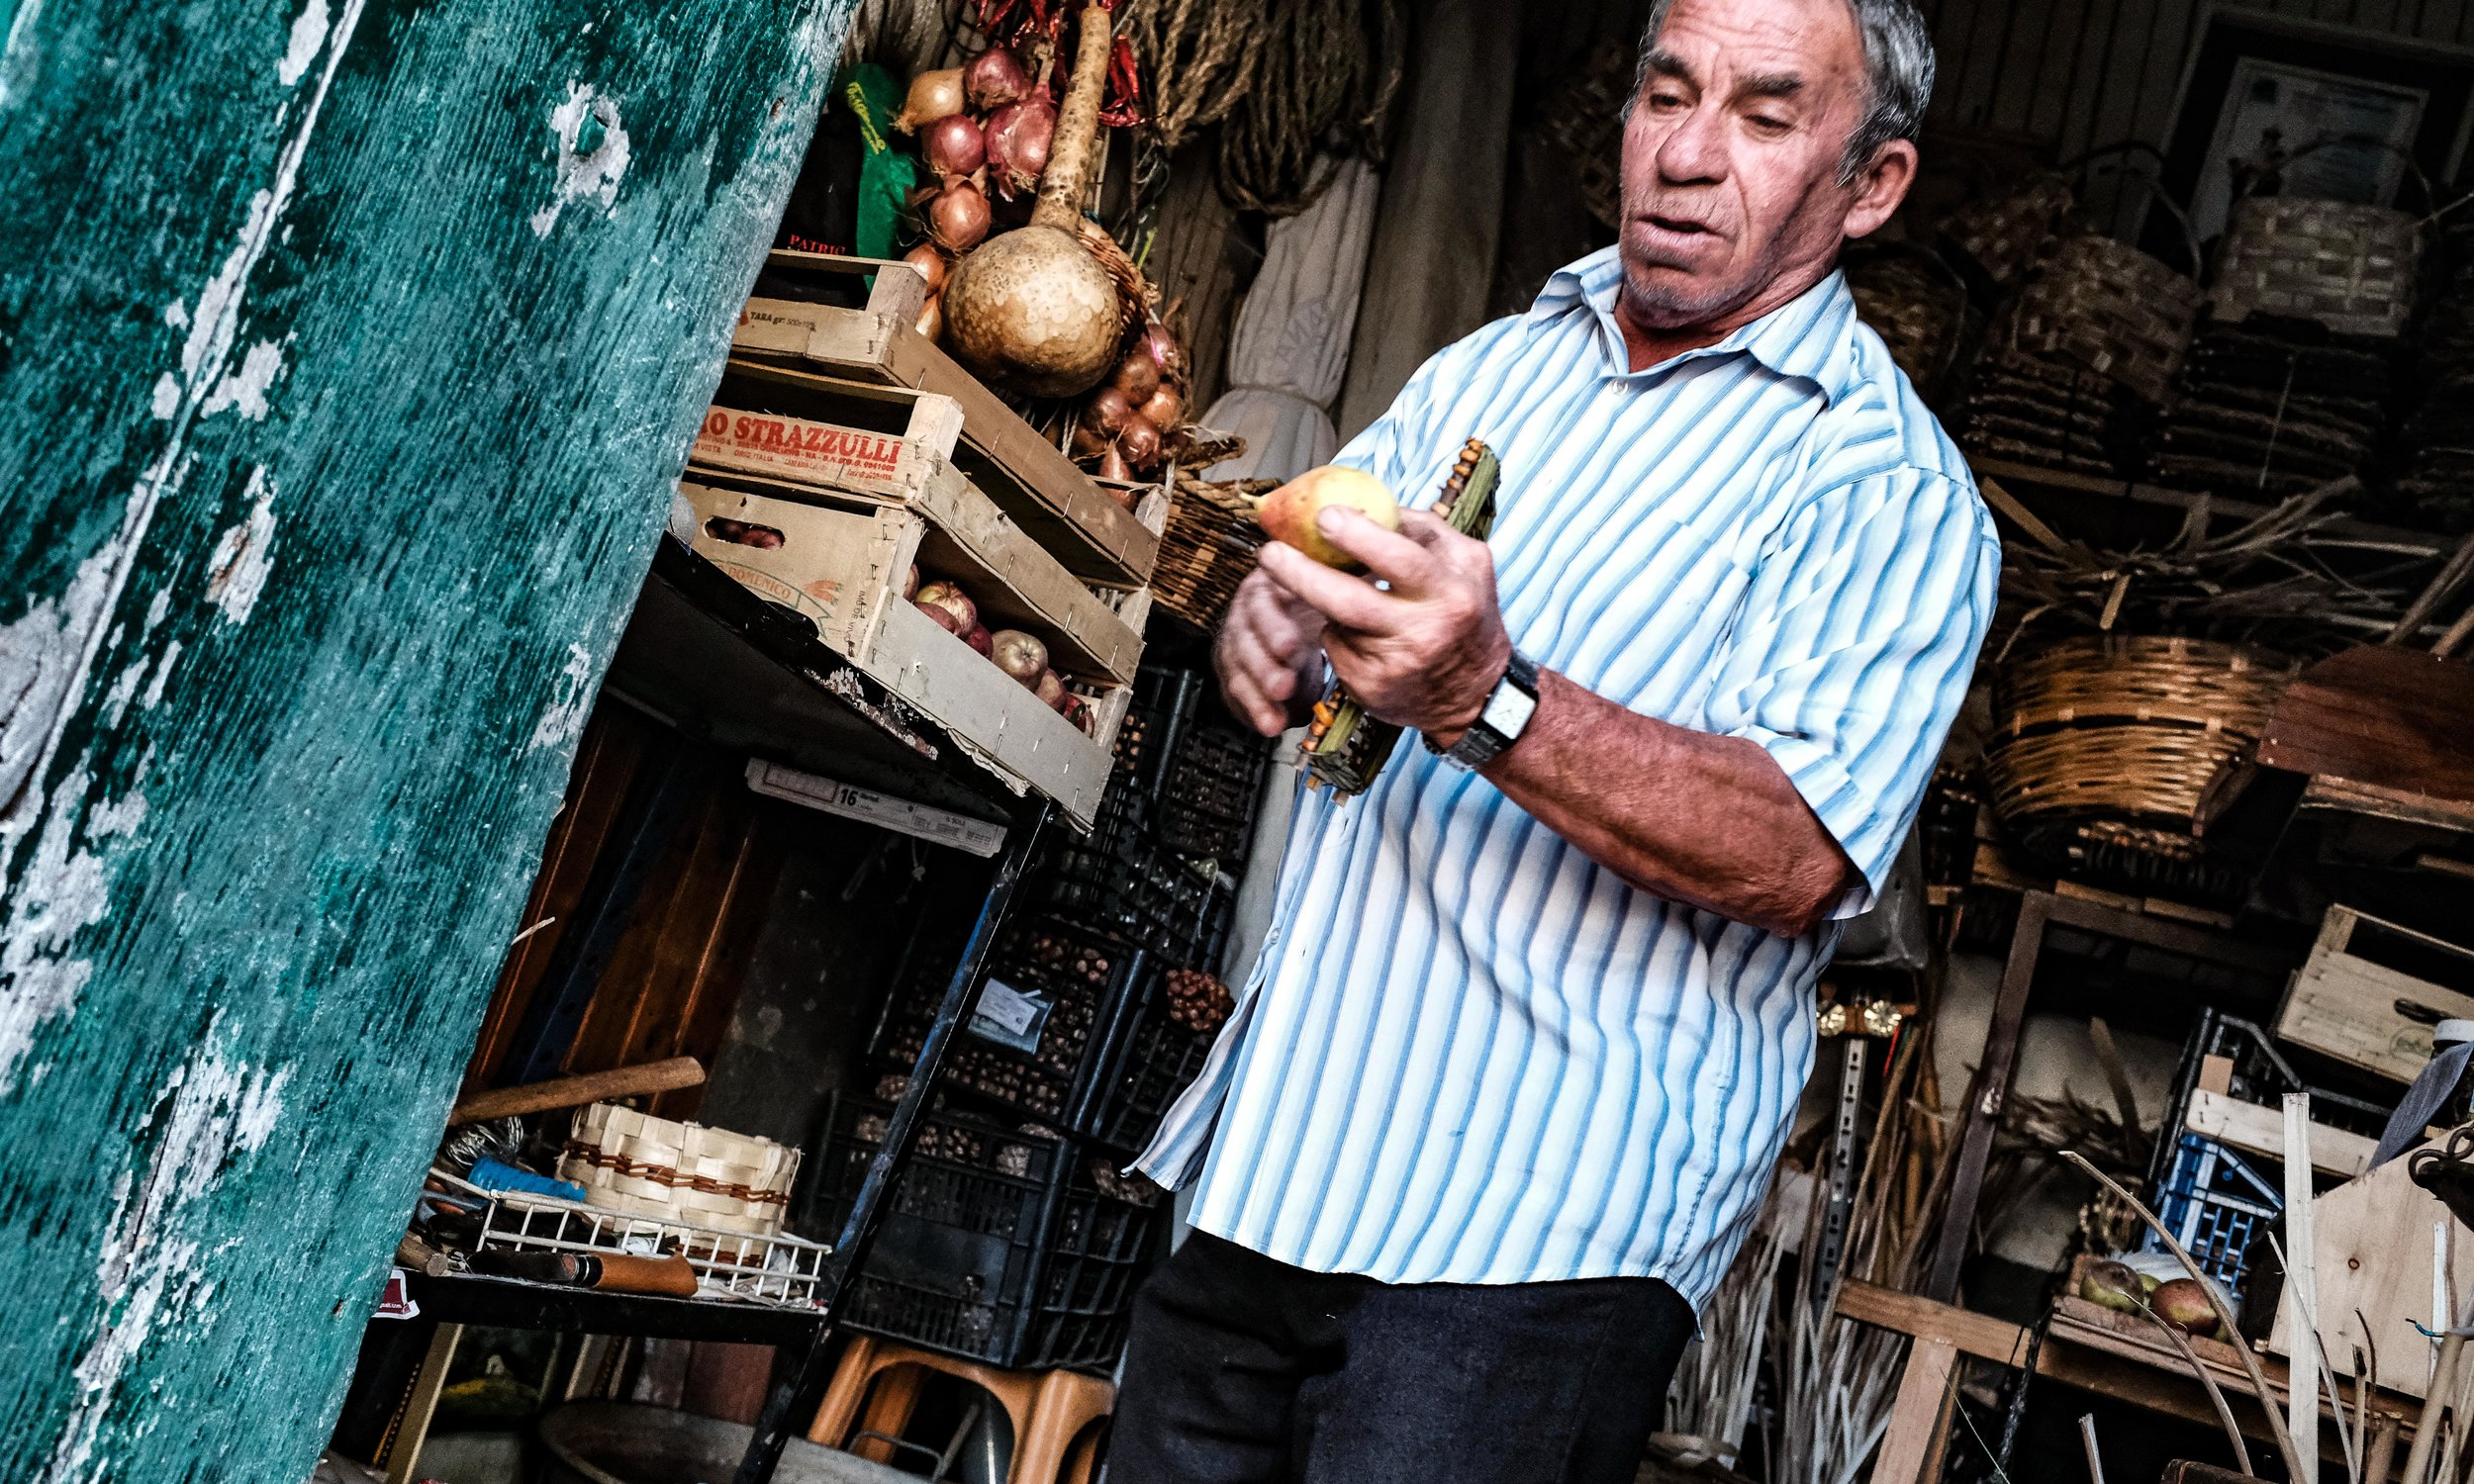 Giuseppe (aka Peppo) in his wee shop in Omignano paese